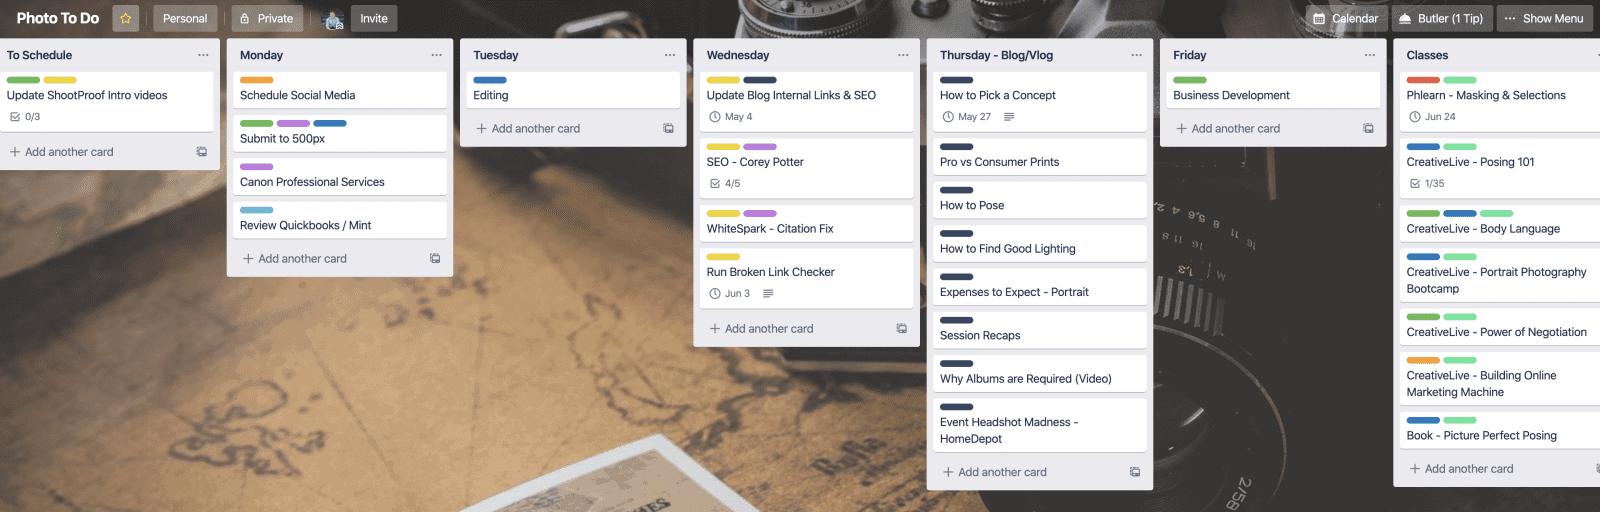 schedule weekly tasks with Trello